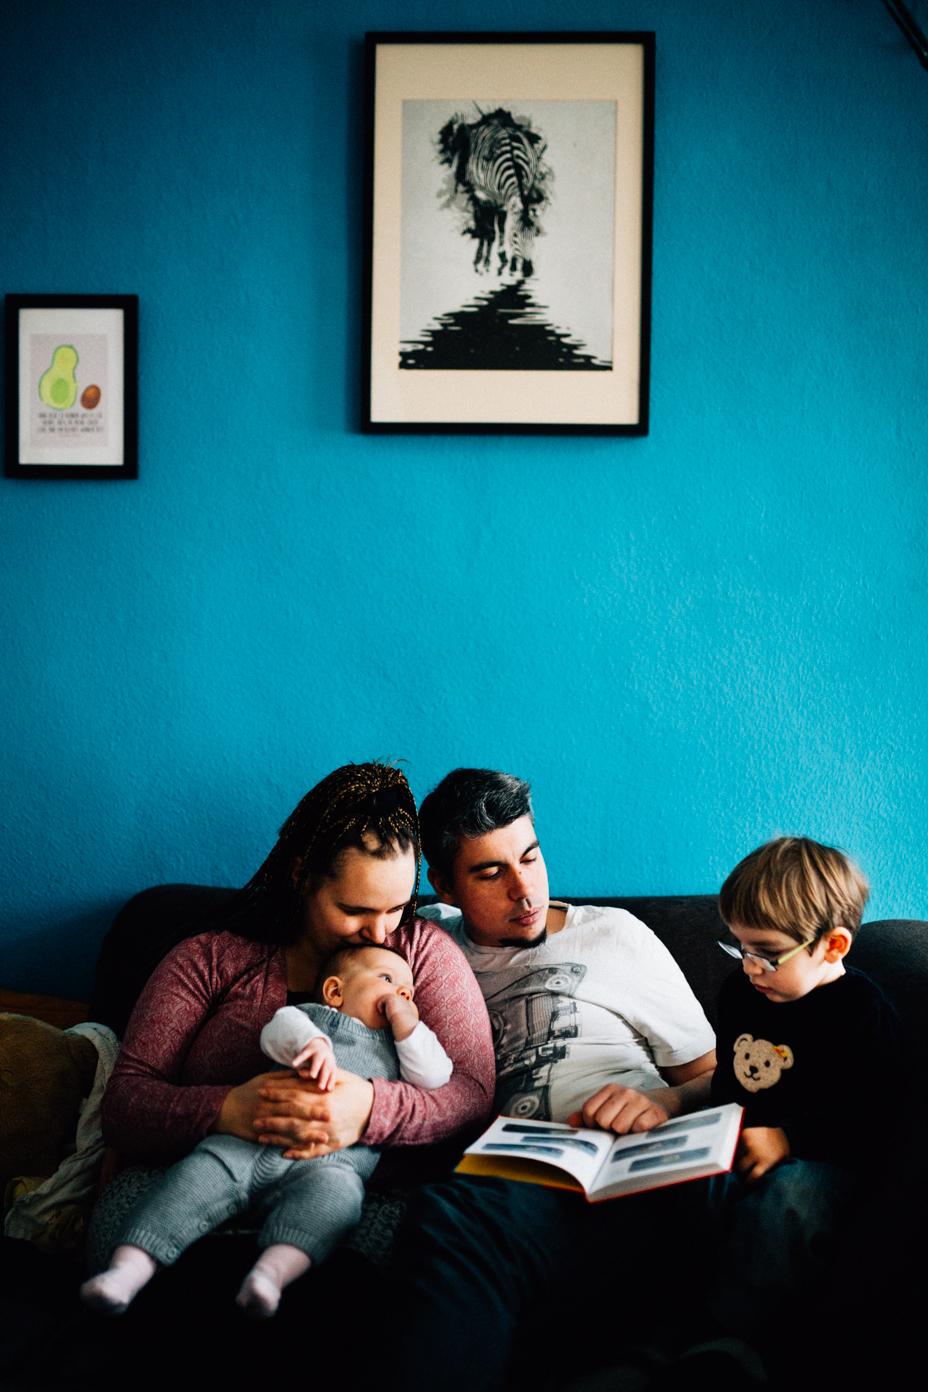 Familienhomestory zu viert Babyfotograf Kassel Babyshooting Kinder Shooting Homestory Fotograf Kassel Hann. Münden Göttingen Familienshooting zuhause Reportage Dokumentation Inka Englisch Photography